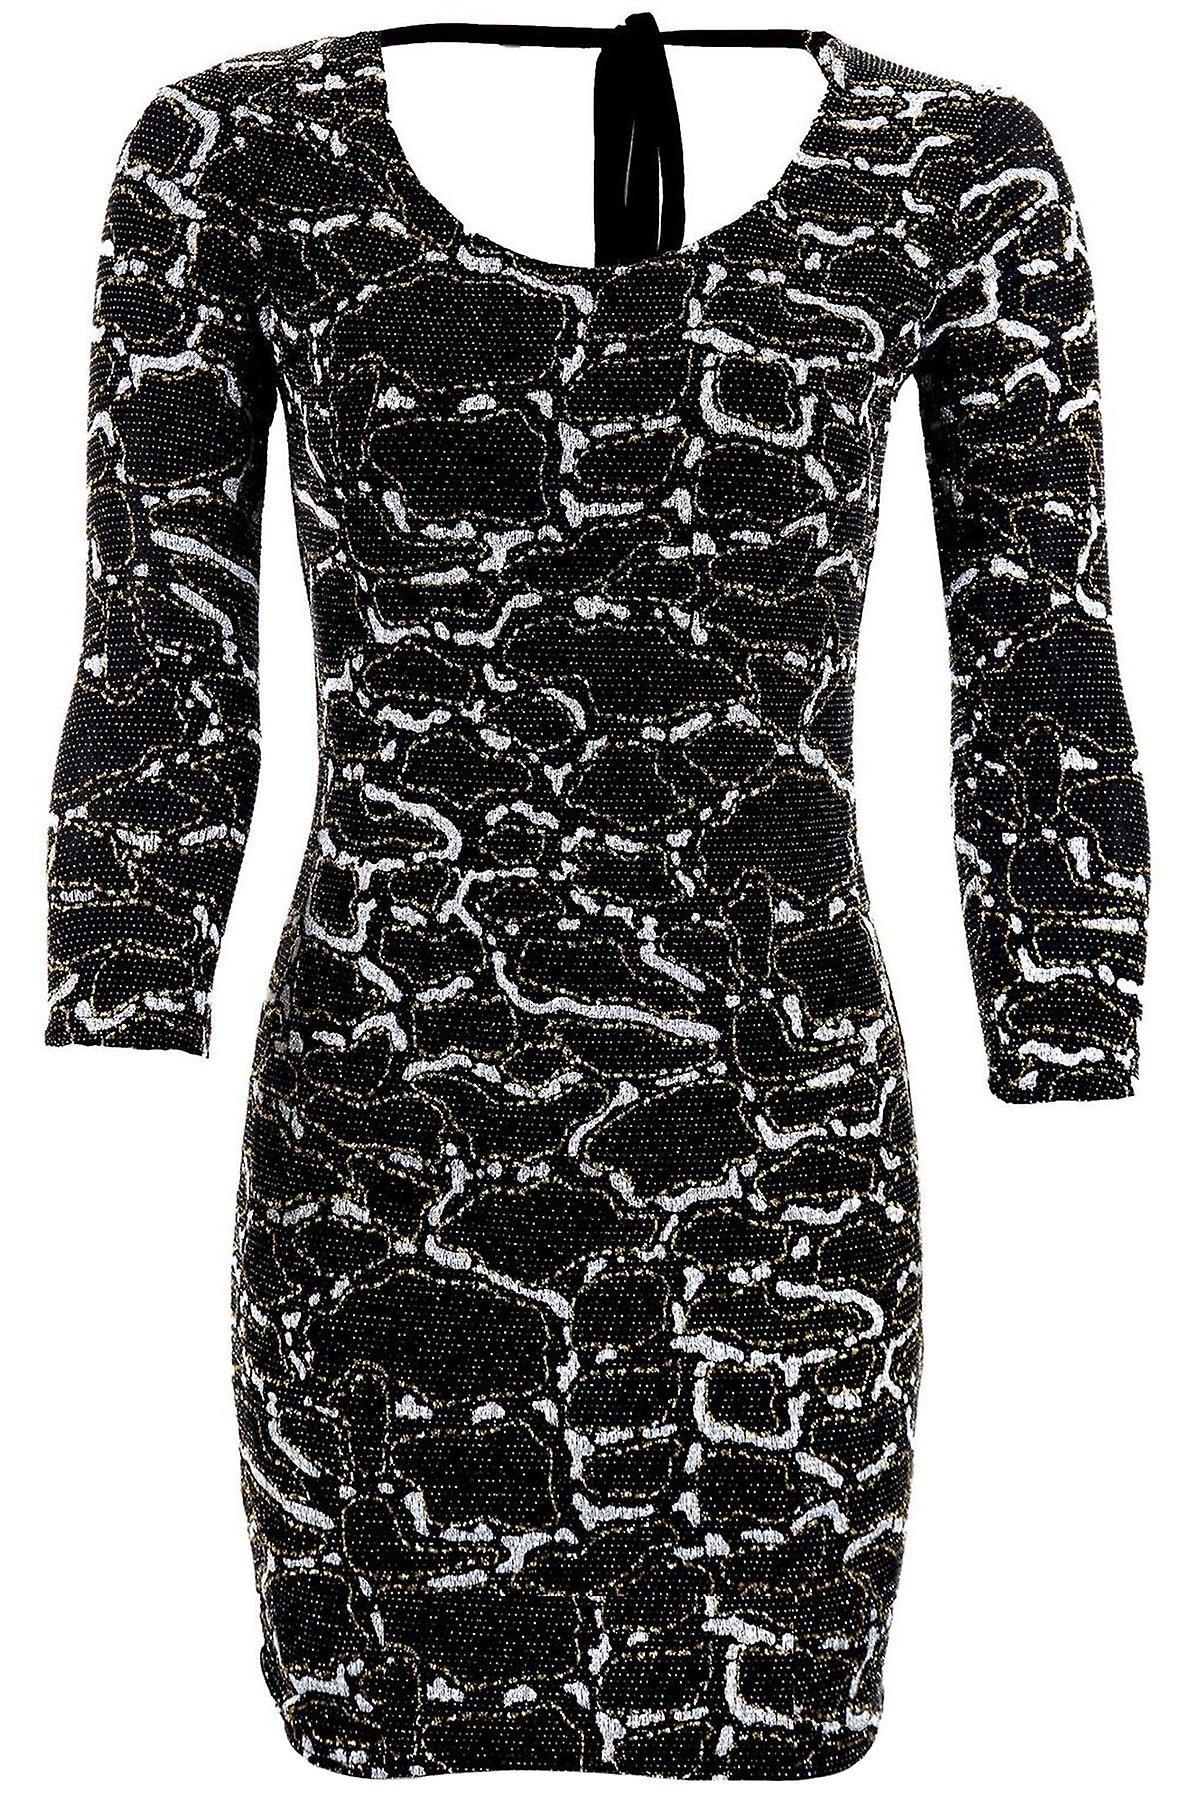 Ladies 3/4 Sleeve Glitter Gathered Tie Low Back Snake Print Womens Bodycon Dress